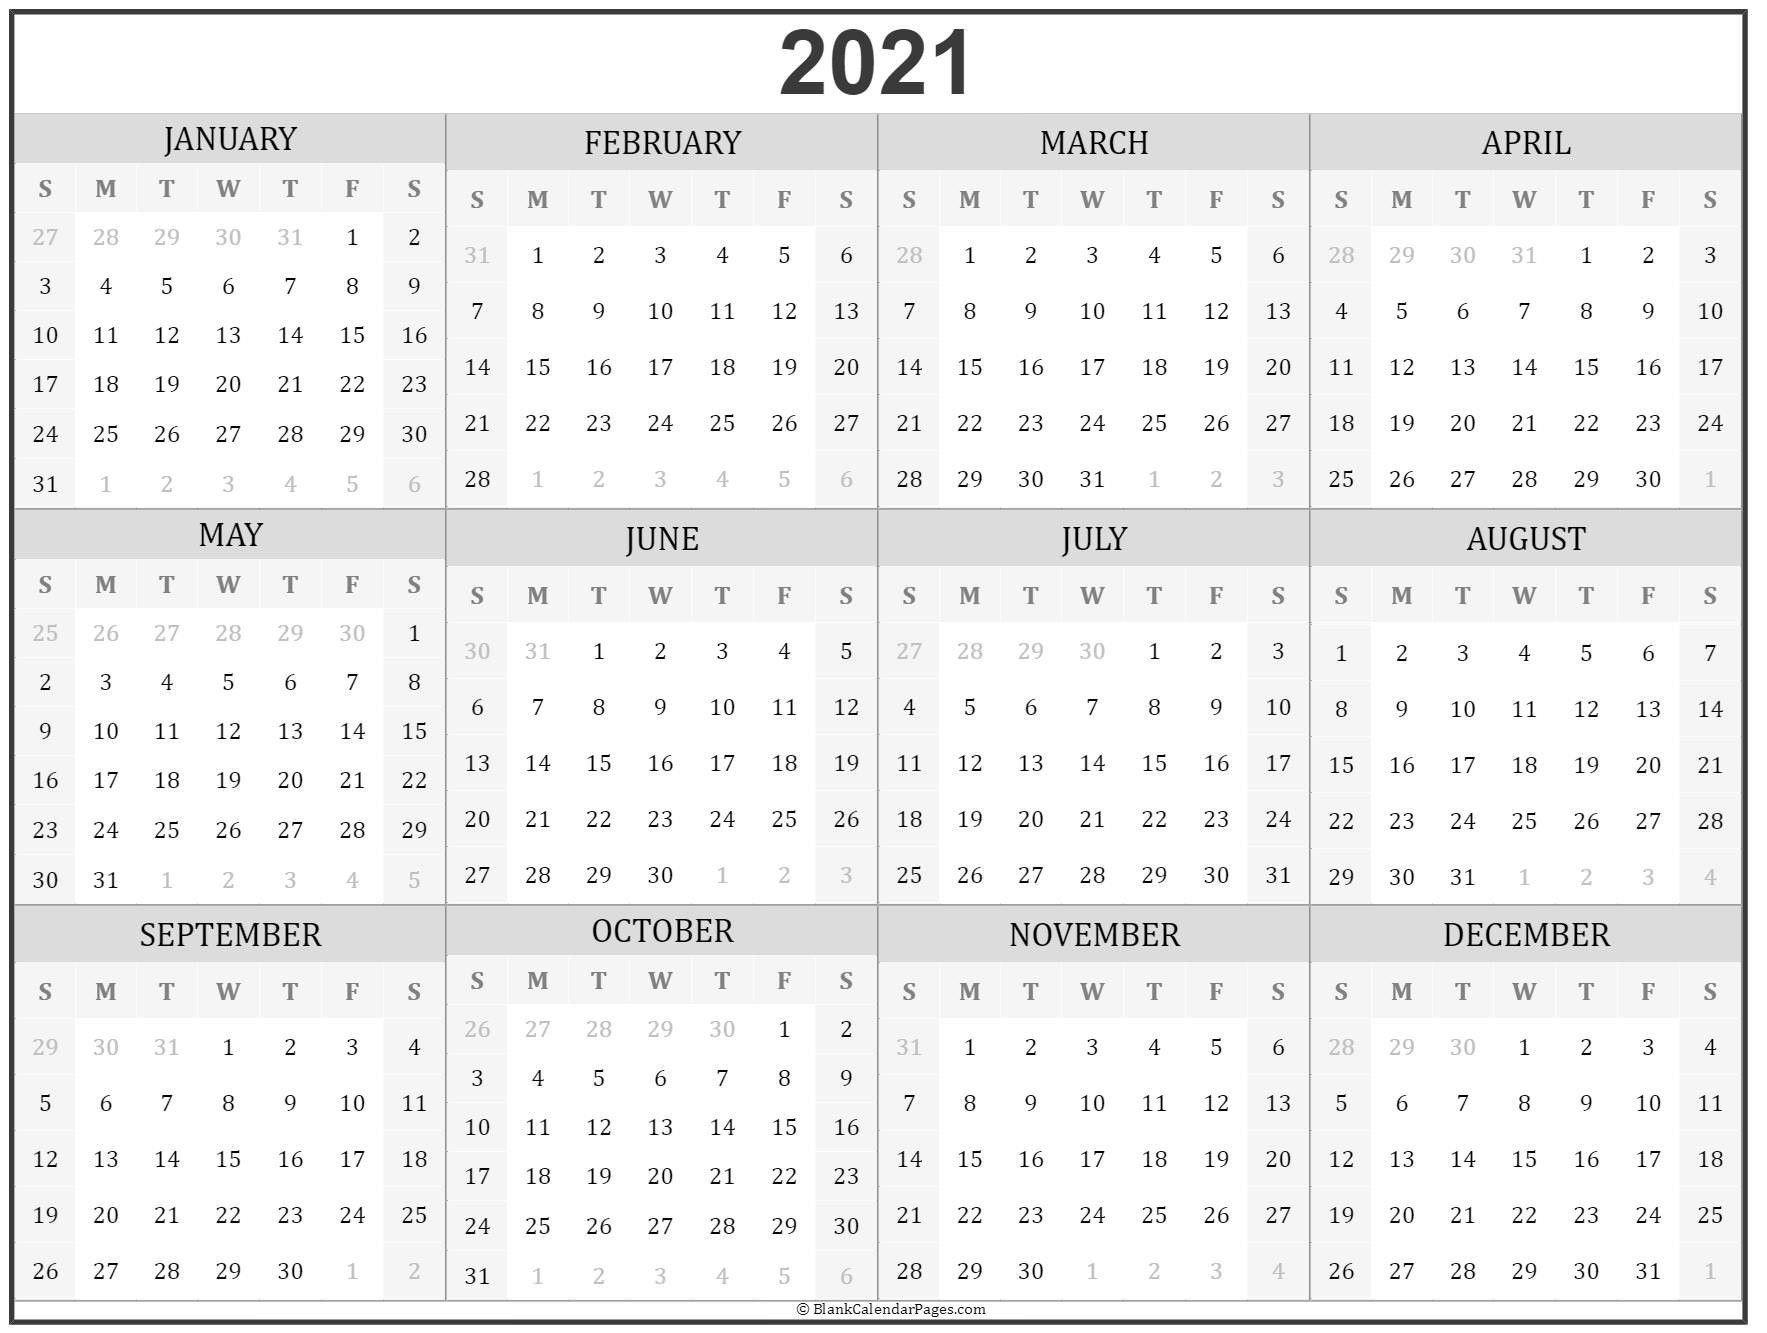 Microsoft Calendar Templates 2021 2 Page Per Month Printable | Calendar Template Printable throughout Free Printable Calendar 2021